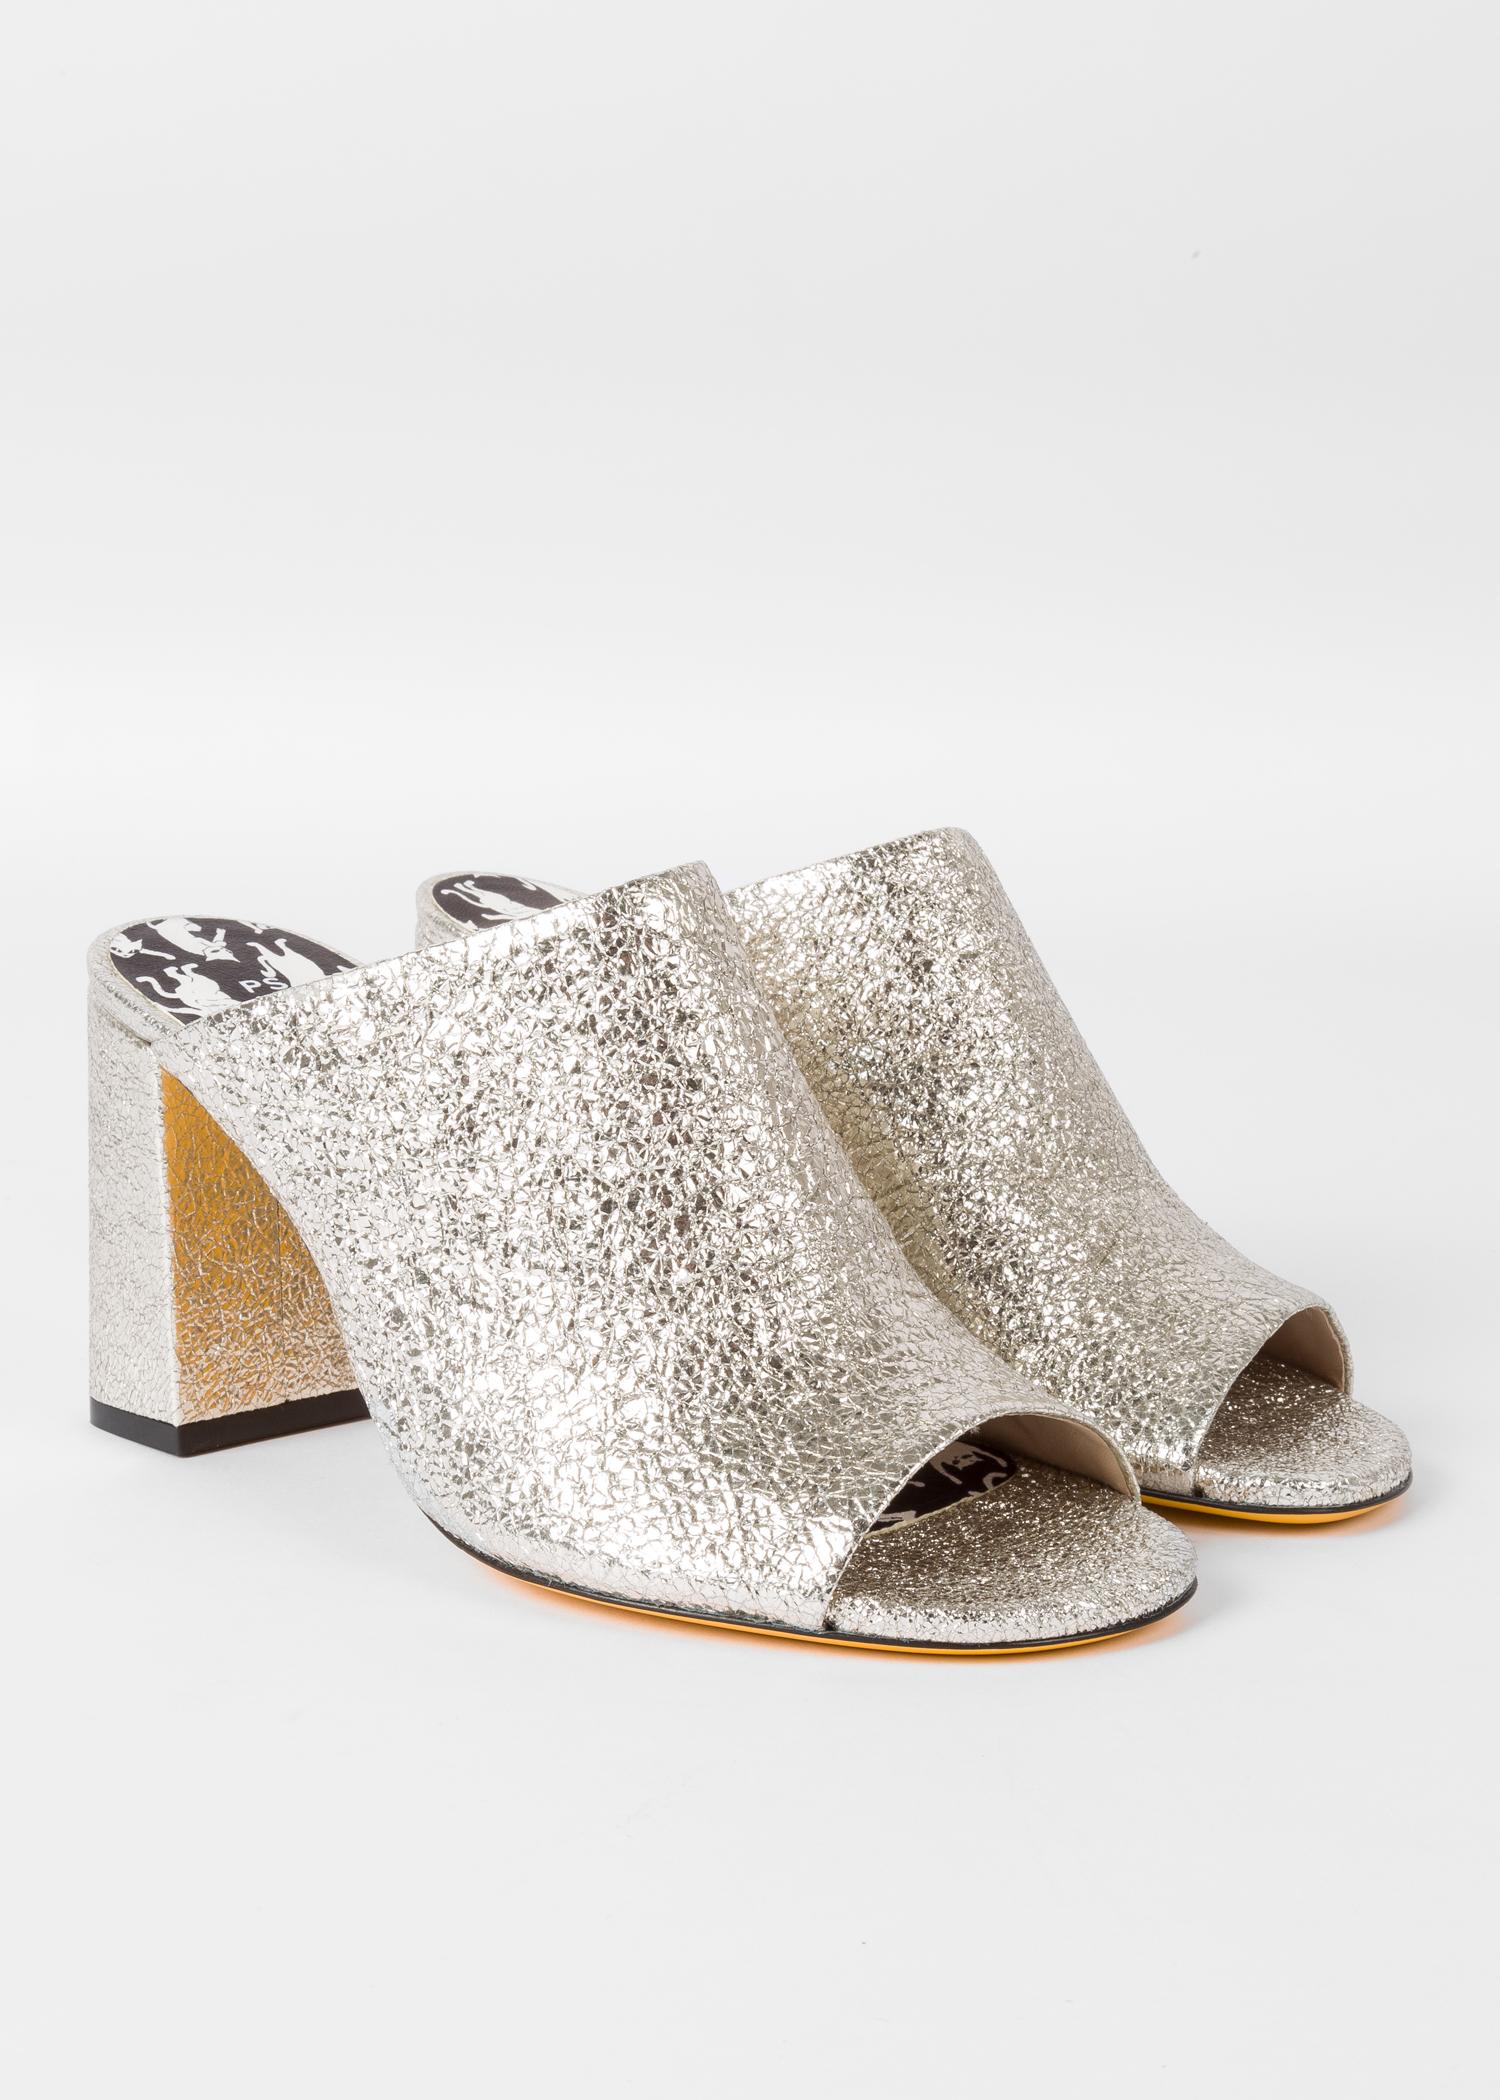 4165fa5aa5c3 Angled view - Women's Silver Glitter Heeled Mules Paul Smith